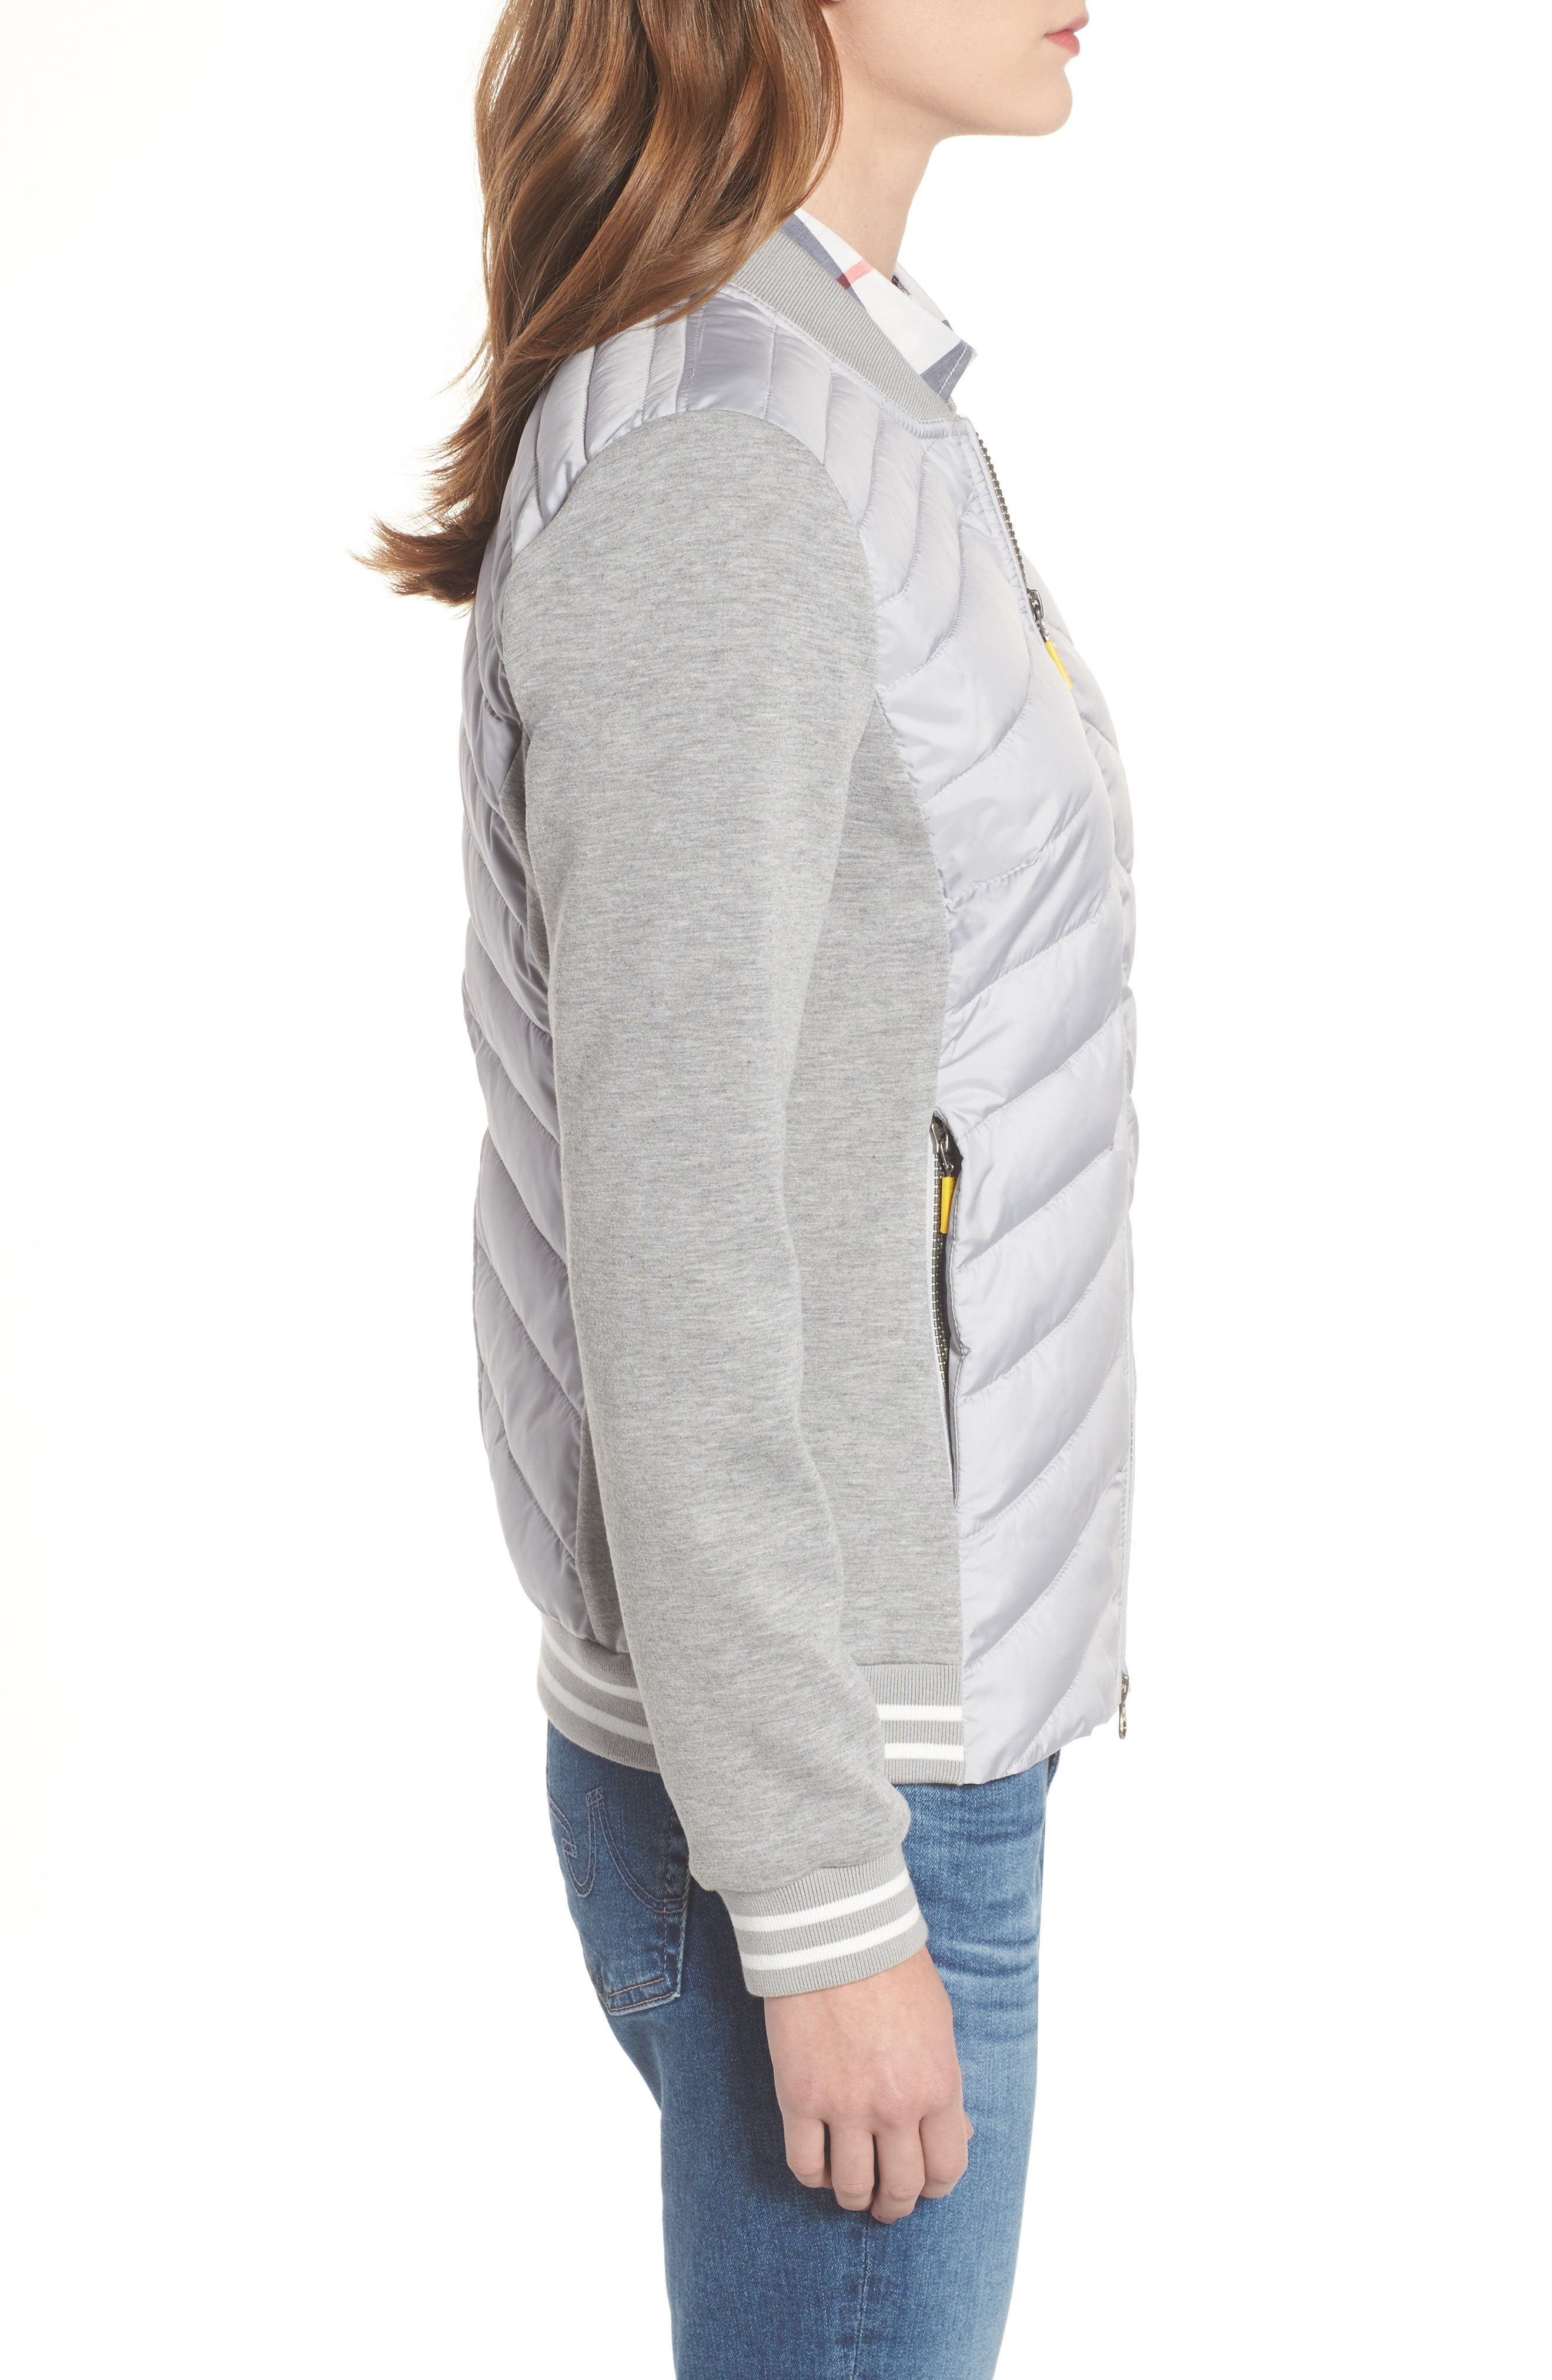 Pembrey Sweatshirt Jacket,                             Alternate thumbnail 3, color,                             Ice White